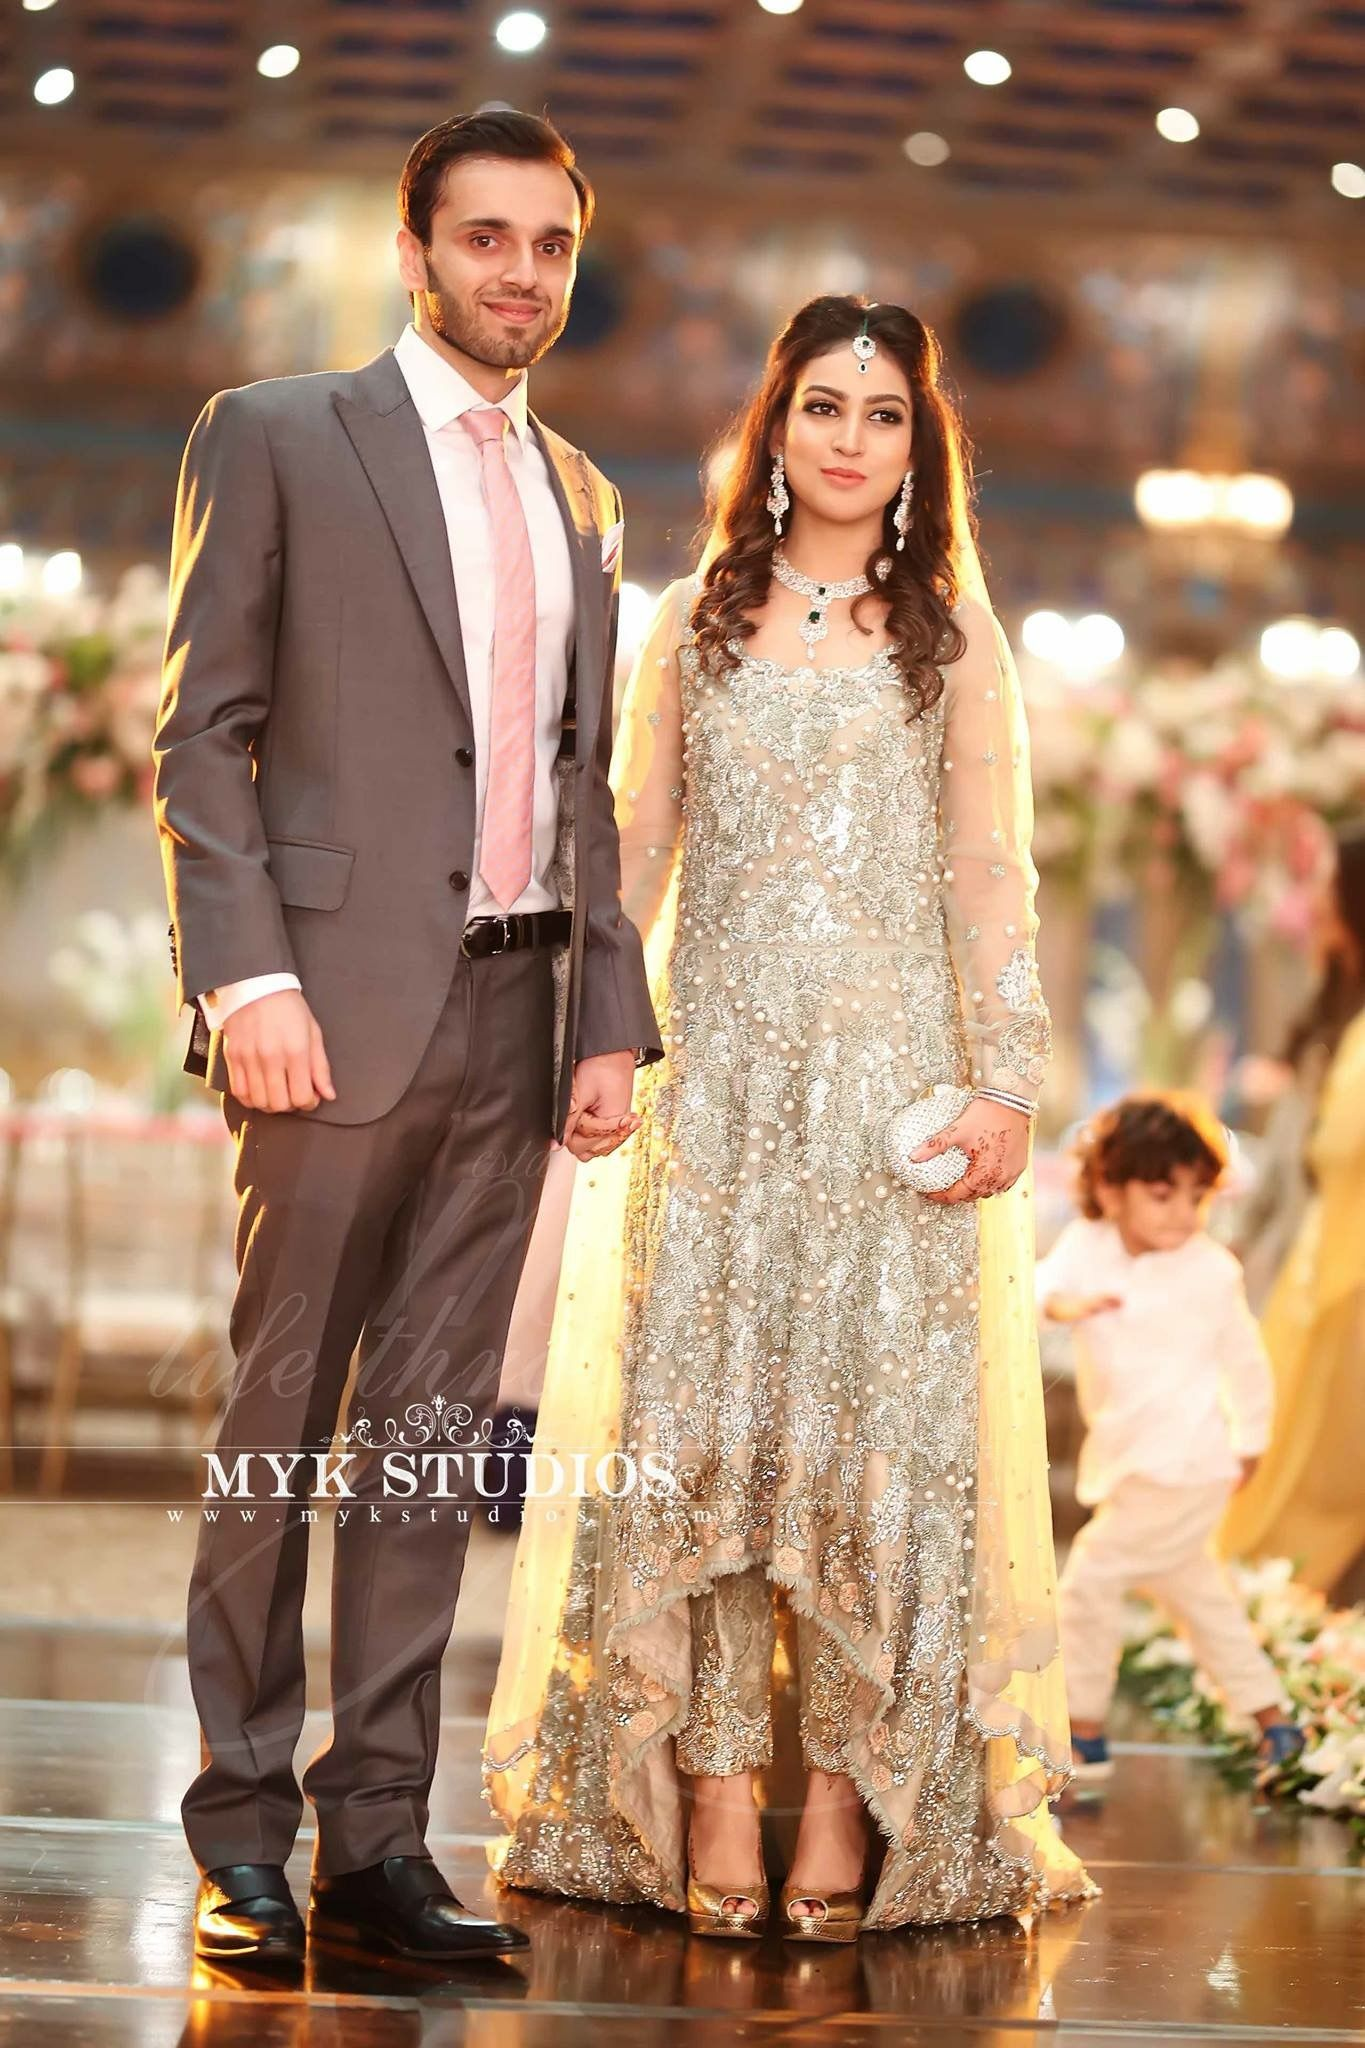 Maxi Style Pakistani Bridal Wear Pakistani Wedding Dresses Bridal Outfits [ 2048 x 1365 Pixel ]